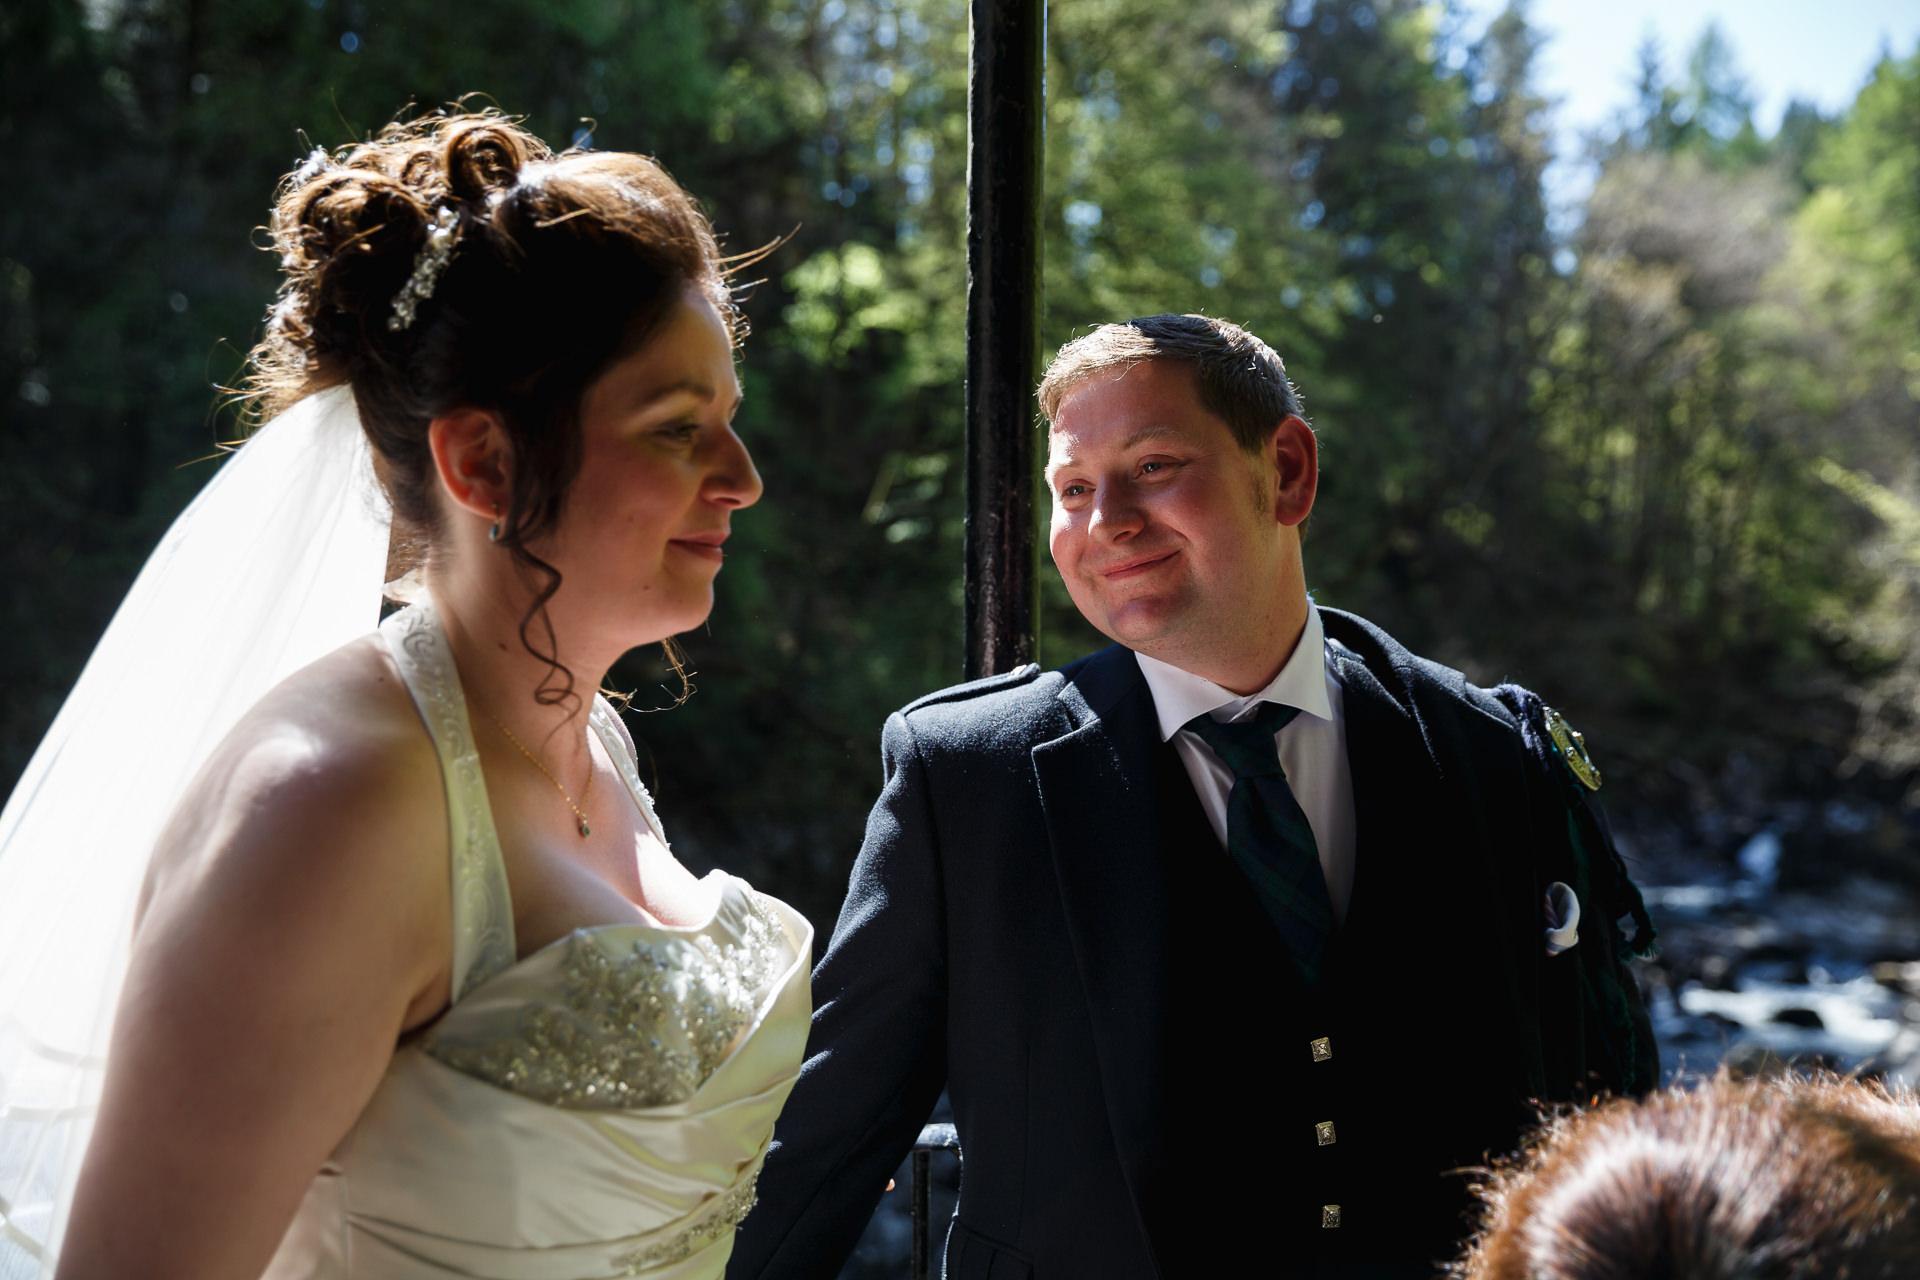 wedding photographer Forfar Angus Dundee relaxed natural fun documentary